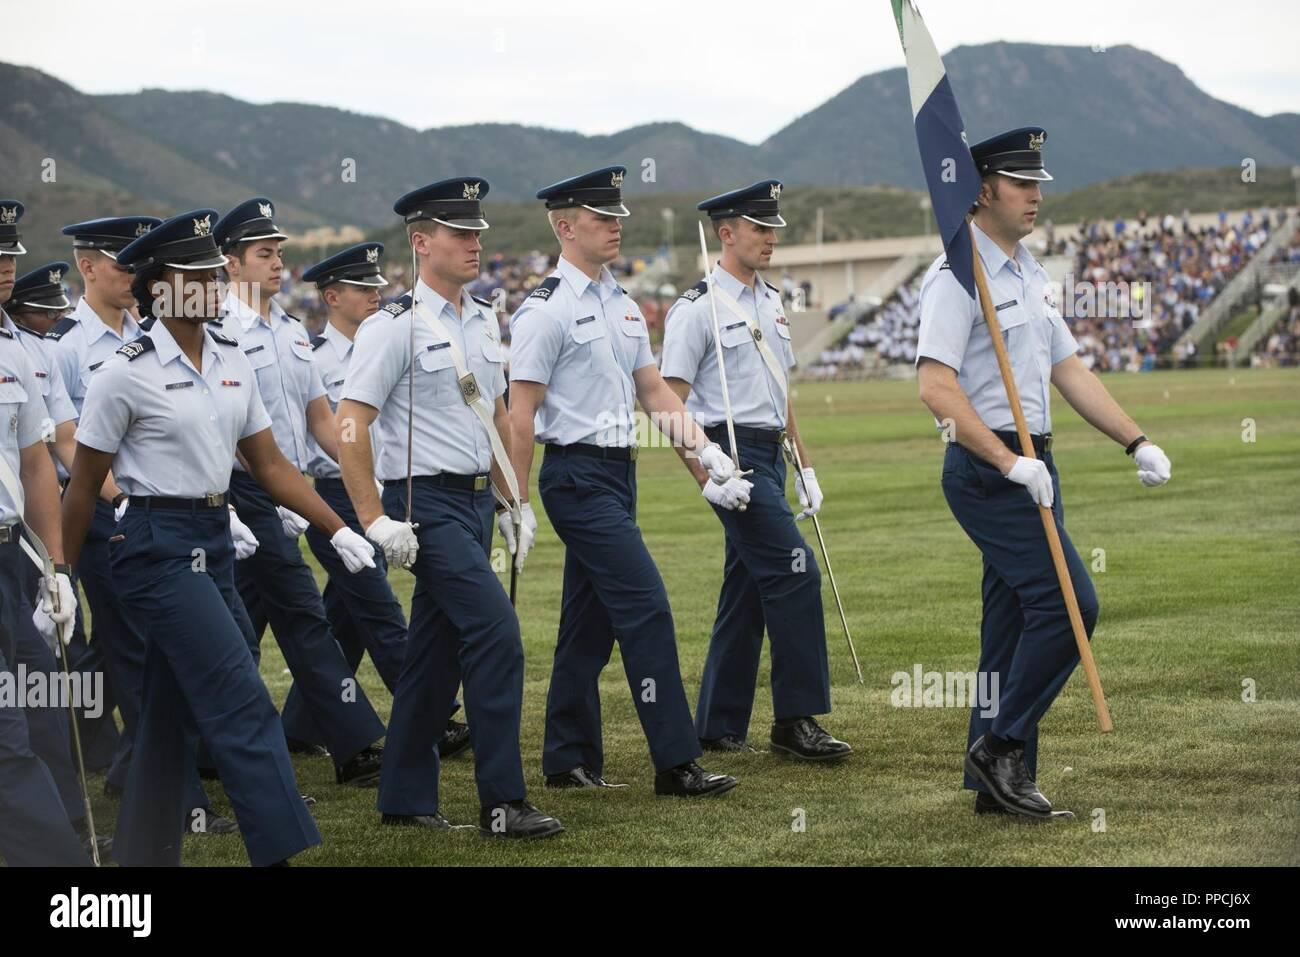 U S  AIR FORCE ACADEMY, Colo  -- U S  Air Force Academy